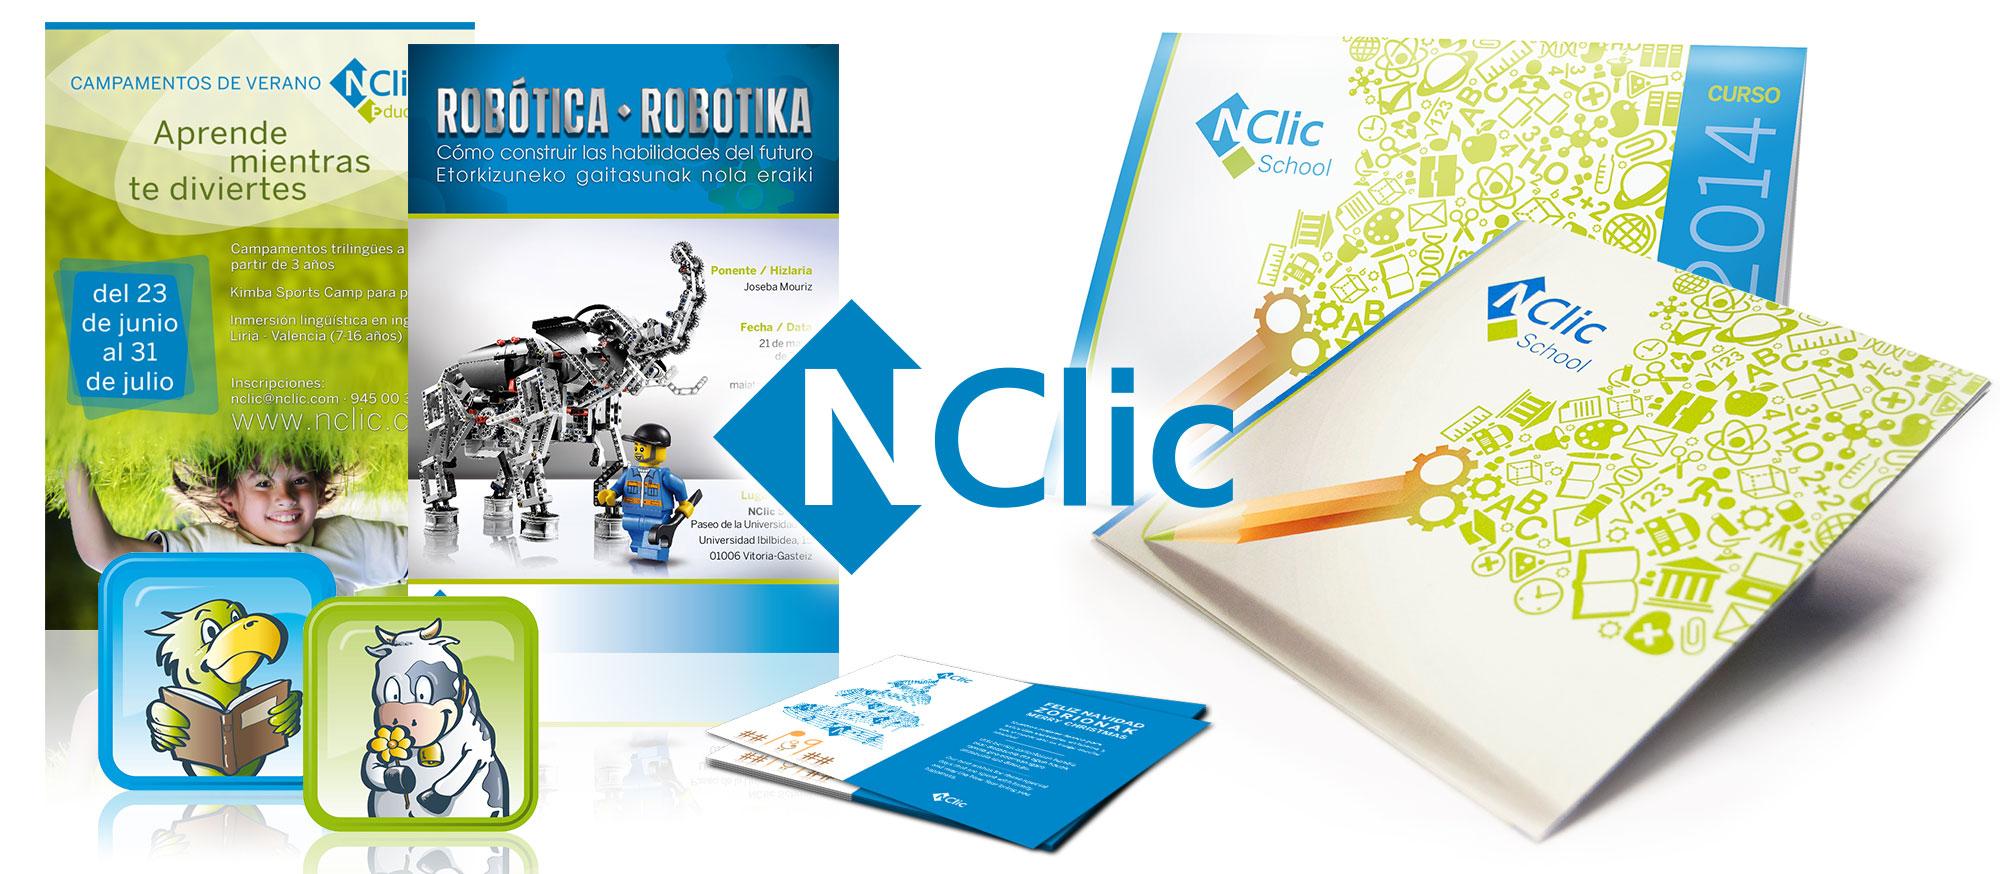 Escuela NClic - Material corporativo